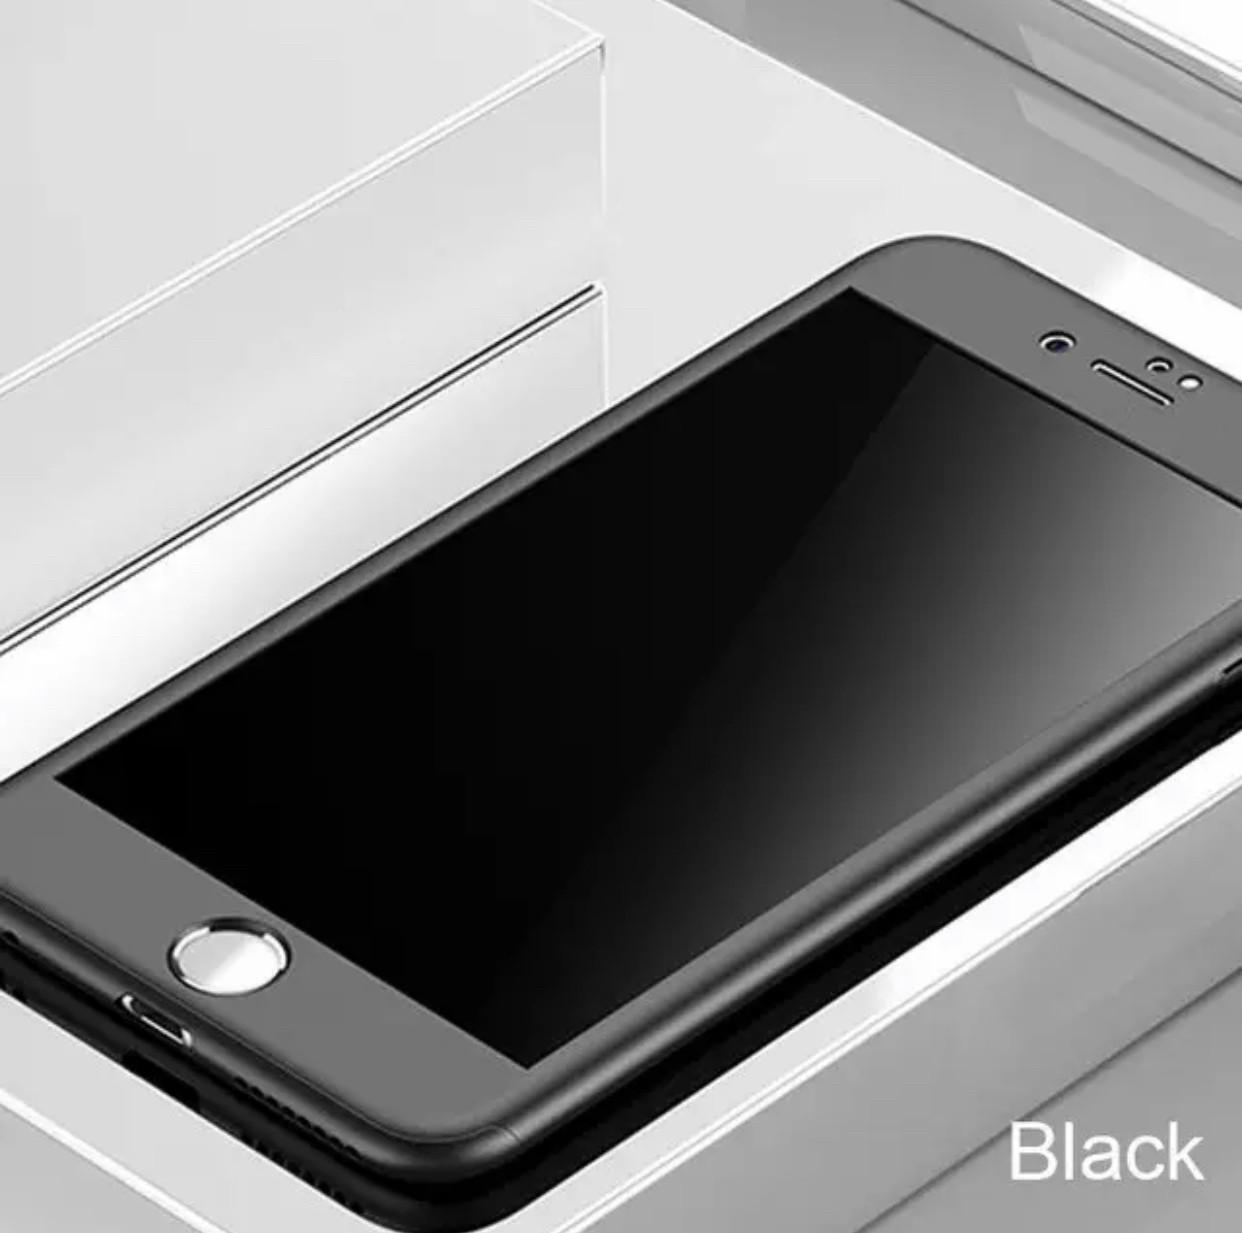 Чехол 360 противоударный для IPhone 6 Plus/6s plus black+ стекло